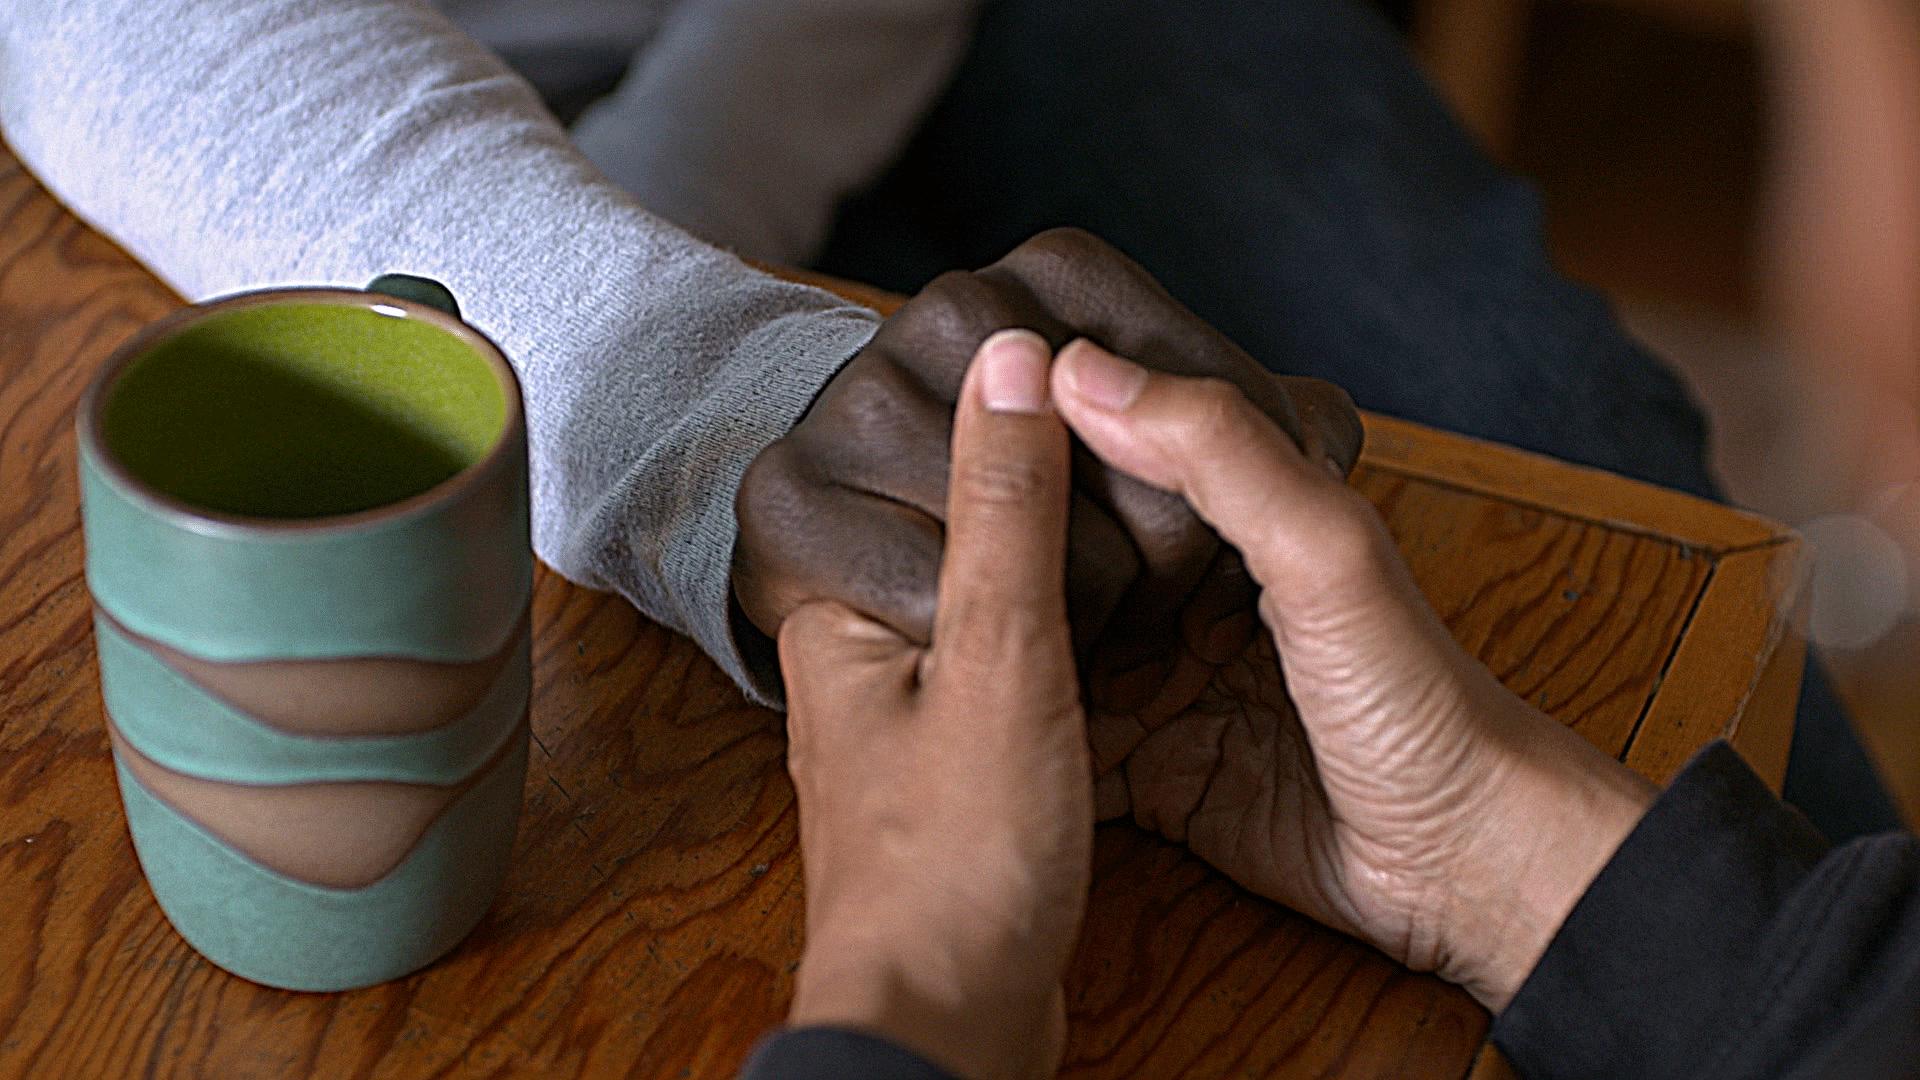 OmarSarah-hands-MOD.png